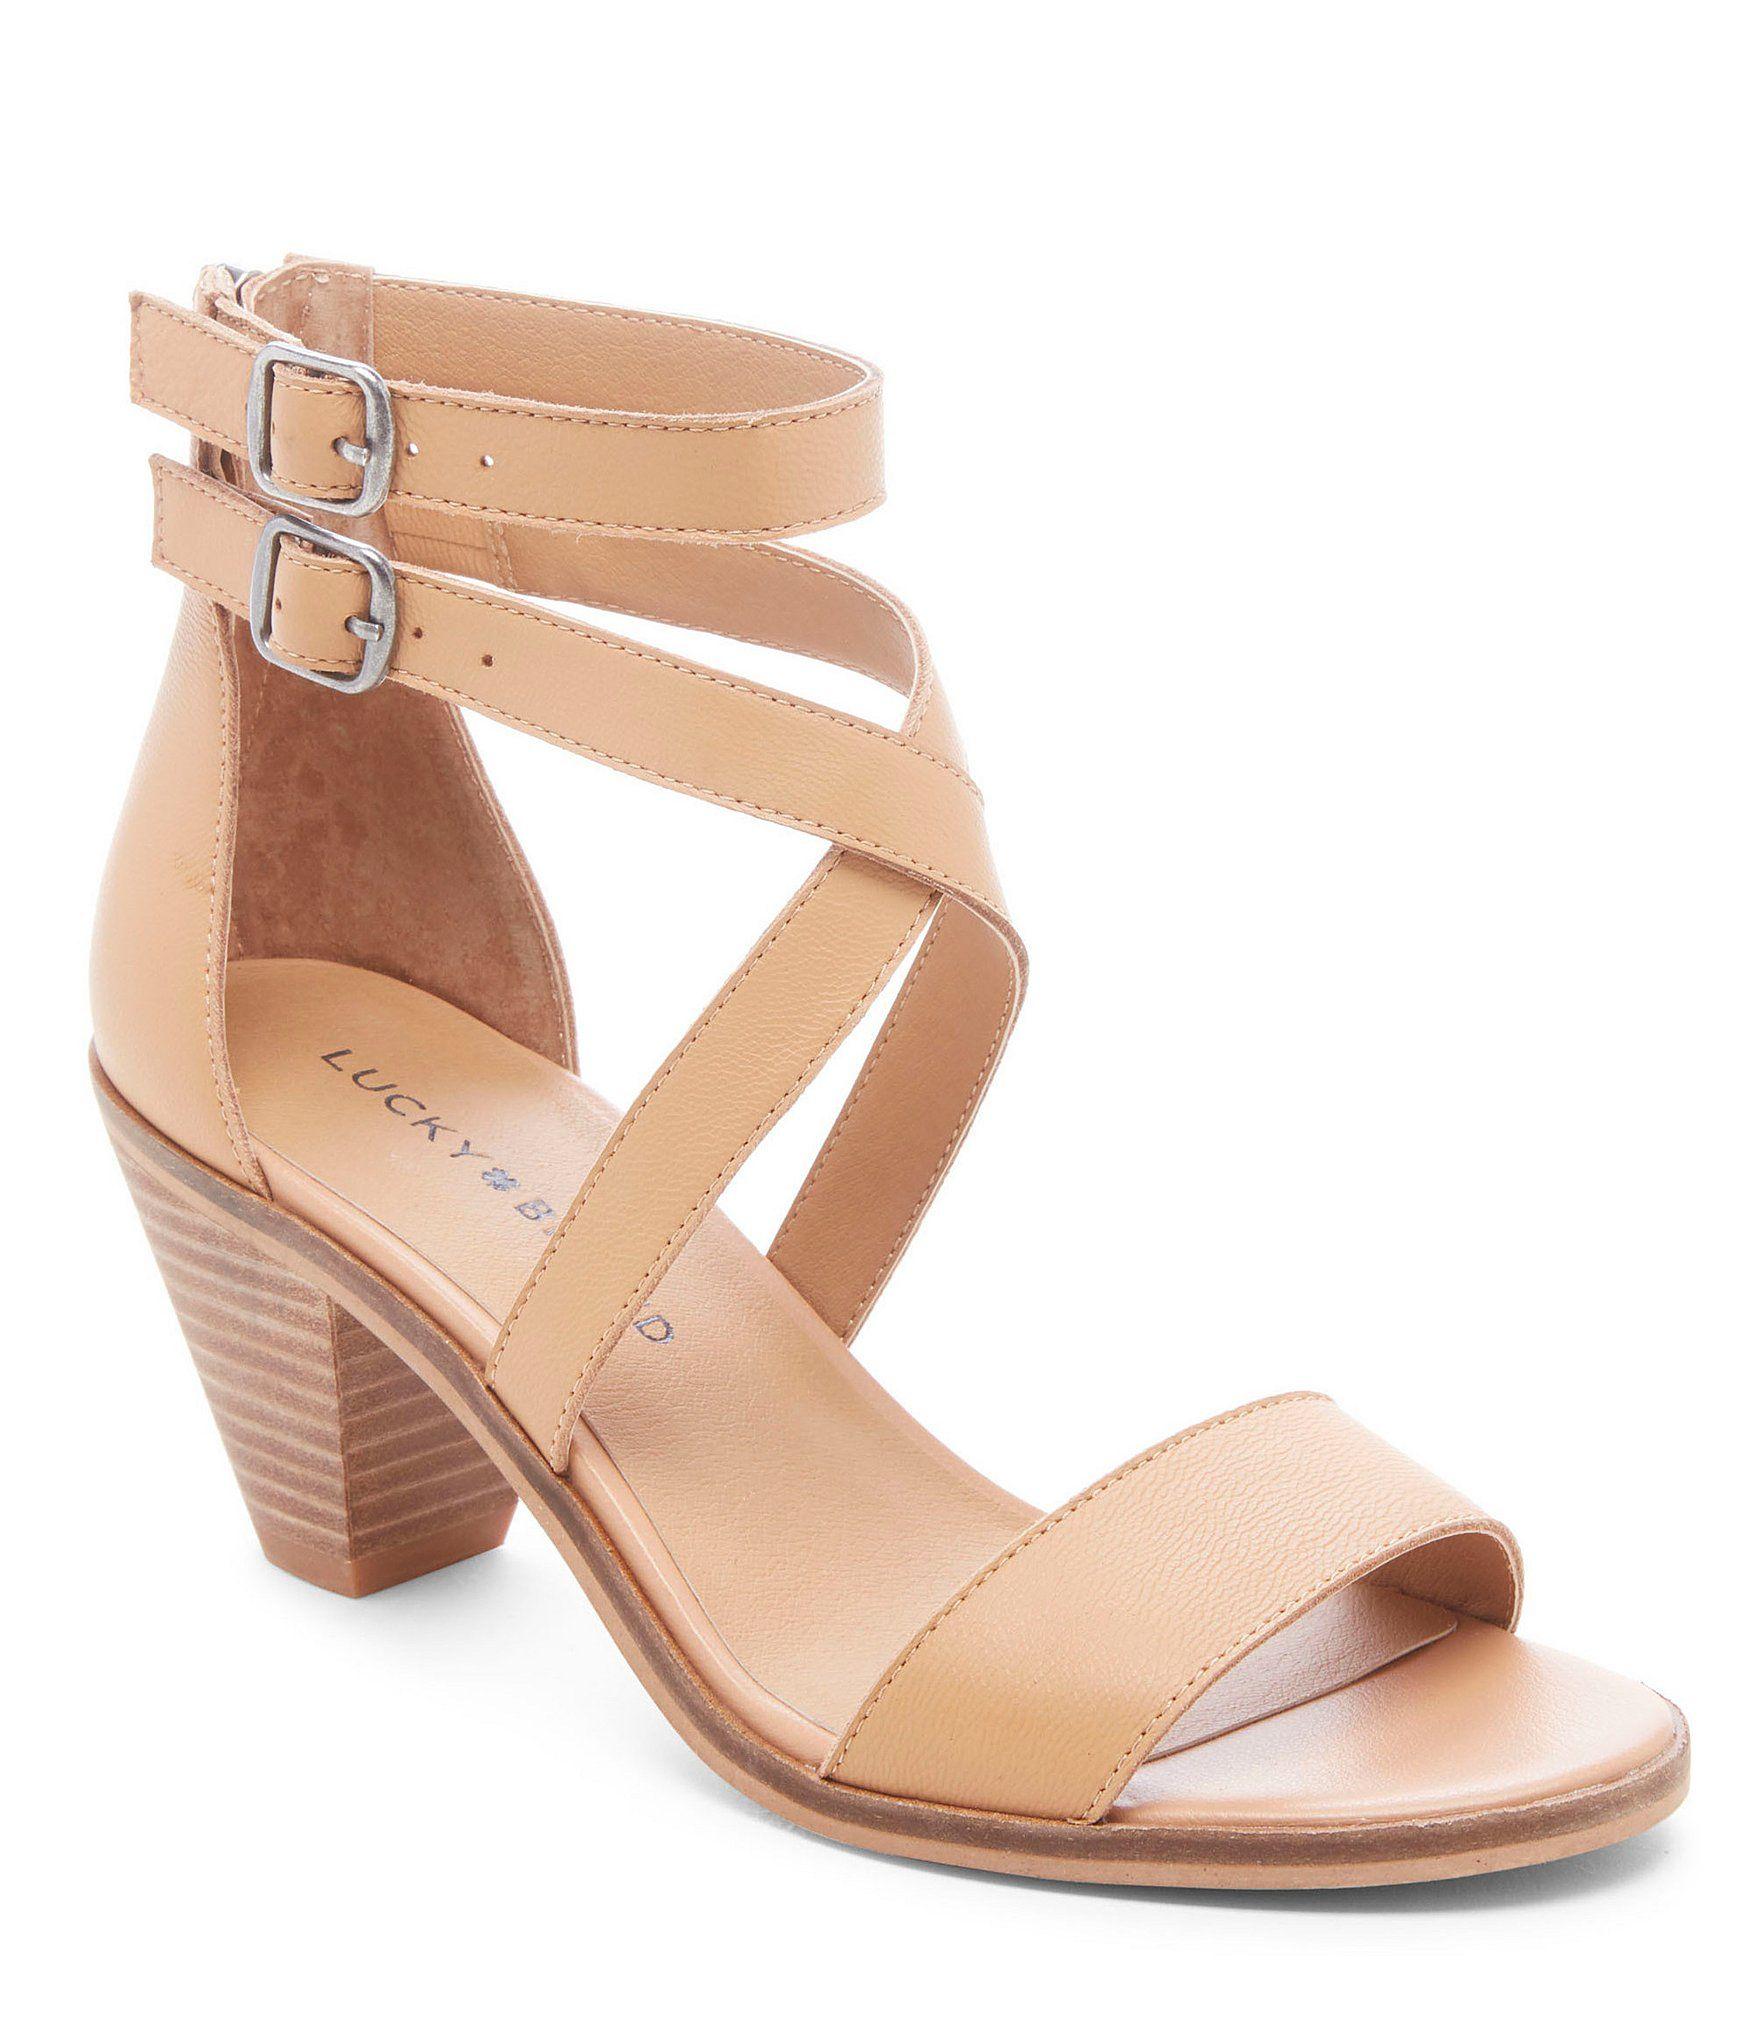 ccf7b2e7f0d TOMS Camilia Leather Geo Woven Block Heel Sandals  Dillards